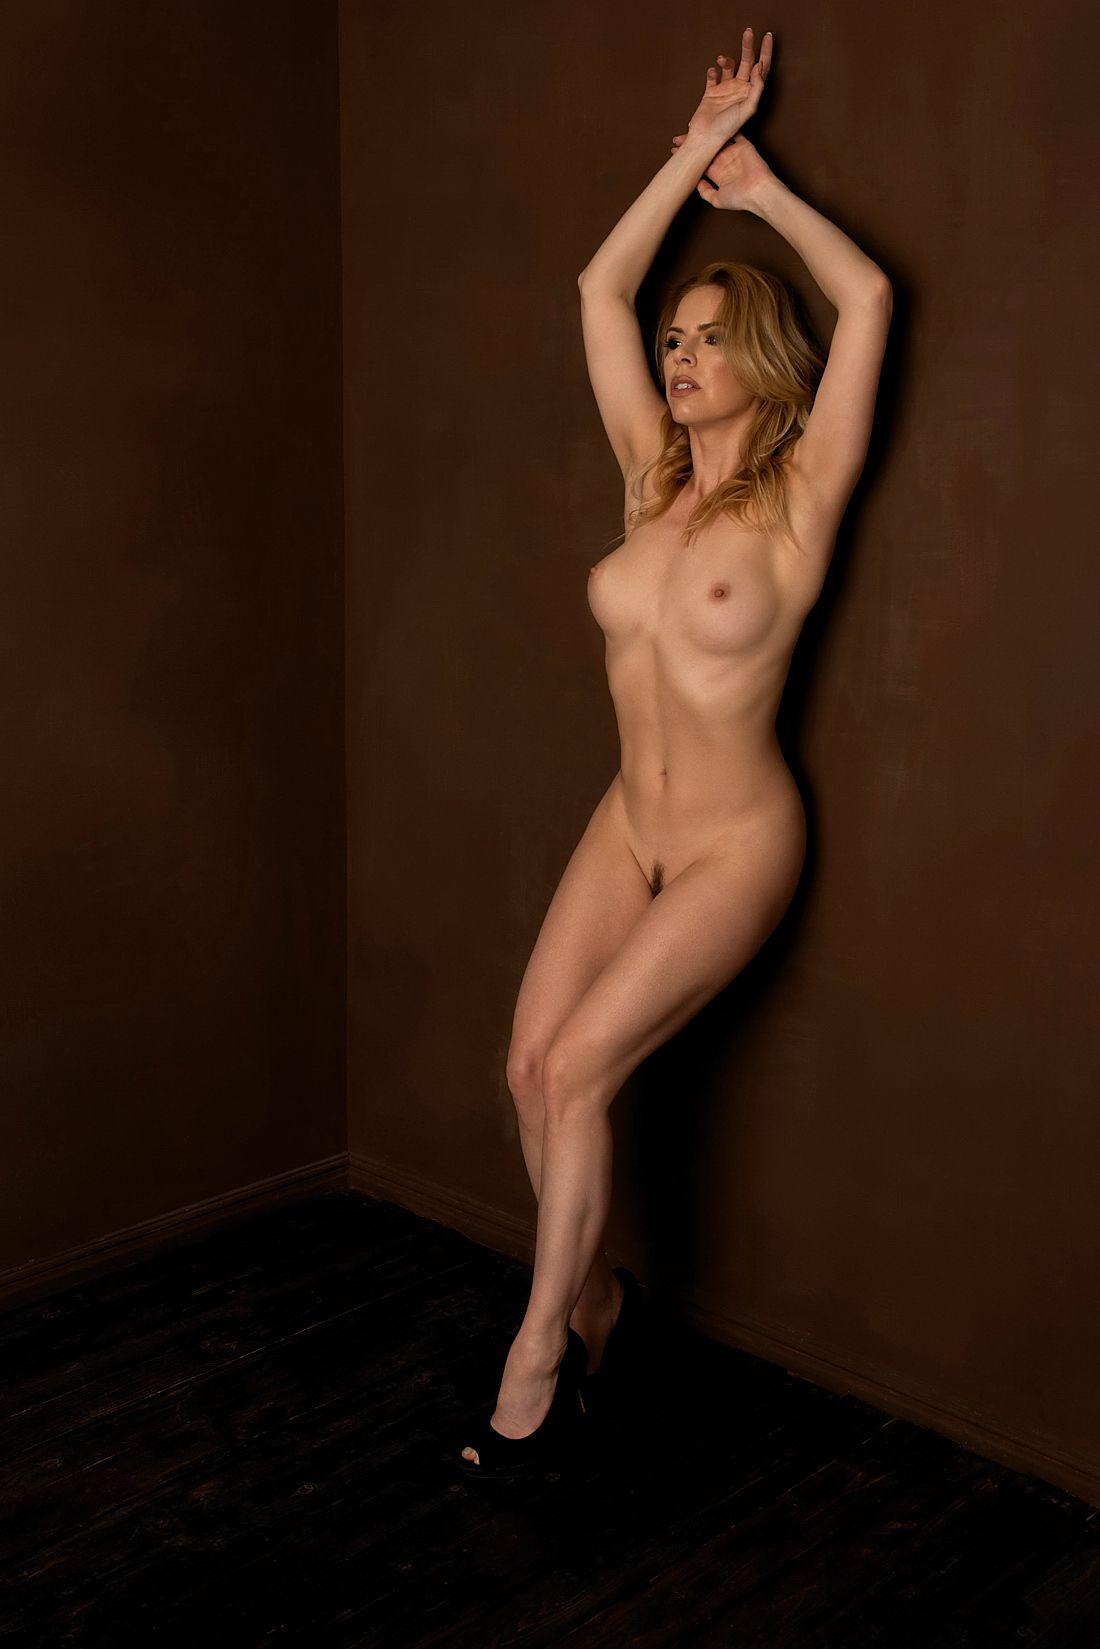 model, fine art, sexy, sensual, colour, woman, female, body, erotica, glamour, curves, portrait, beautiful, nude, naked, legs,, Lajos Csáki